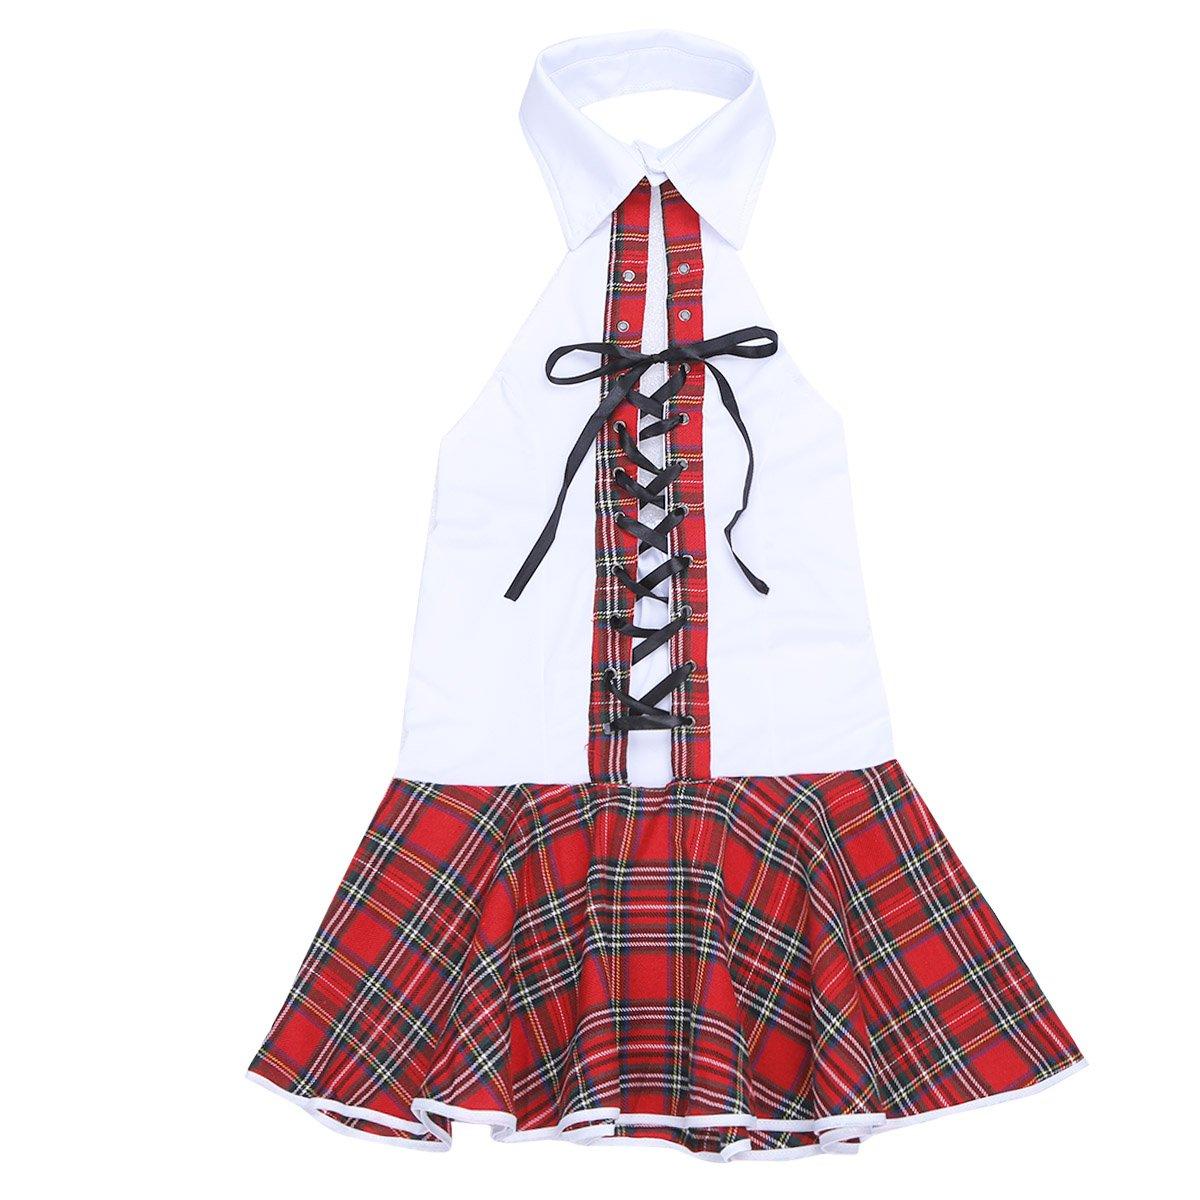 iiniim Women Lingerie Set Role Play Cute Schoolgirl Plaid Uniform Student Costumes Outfit